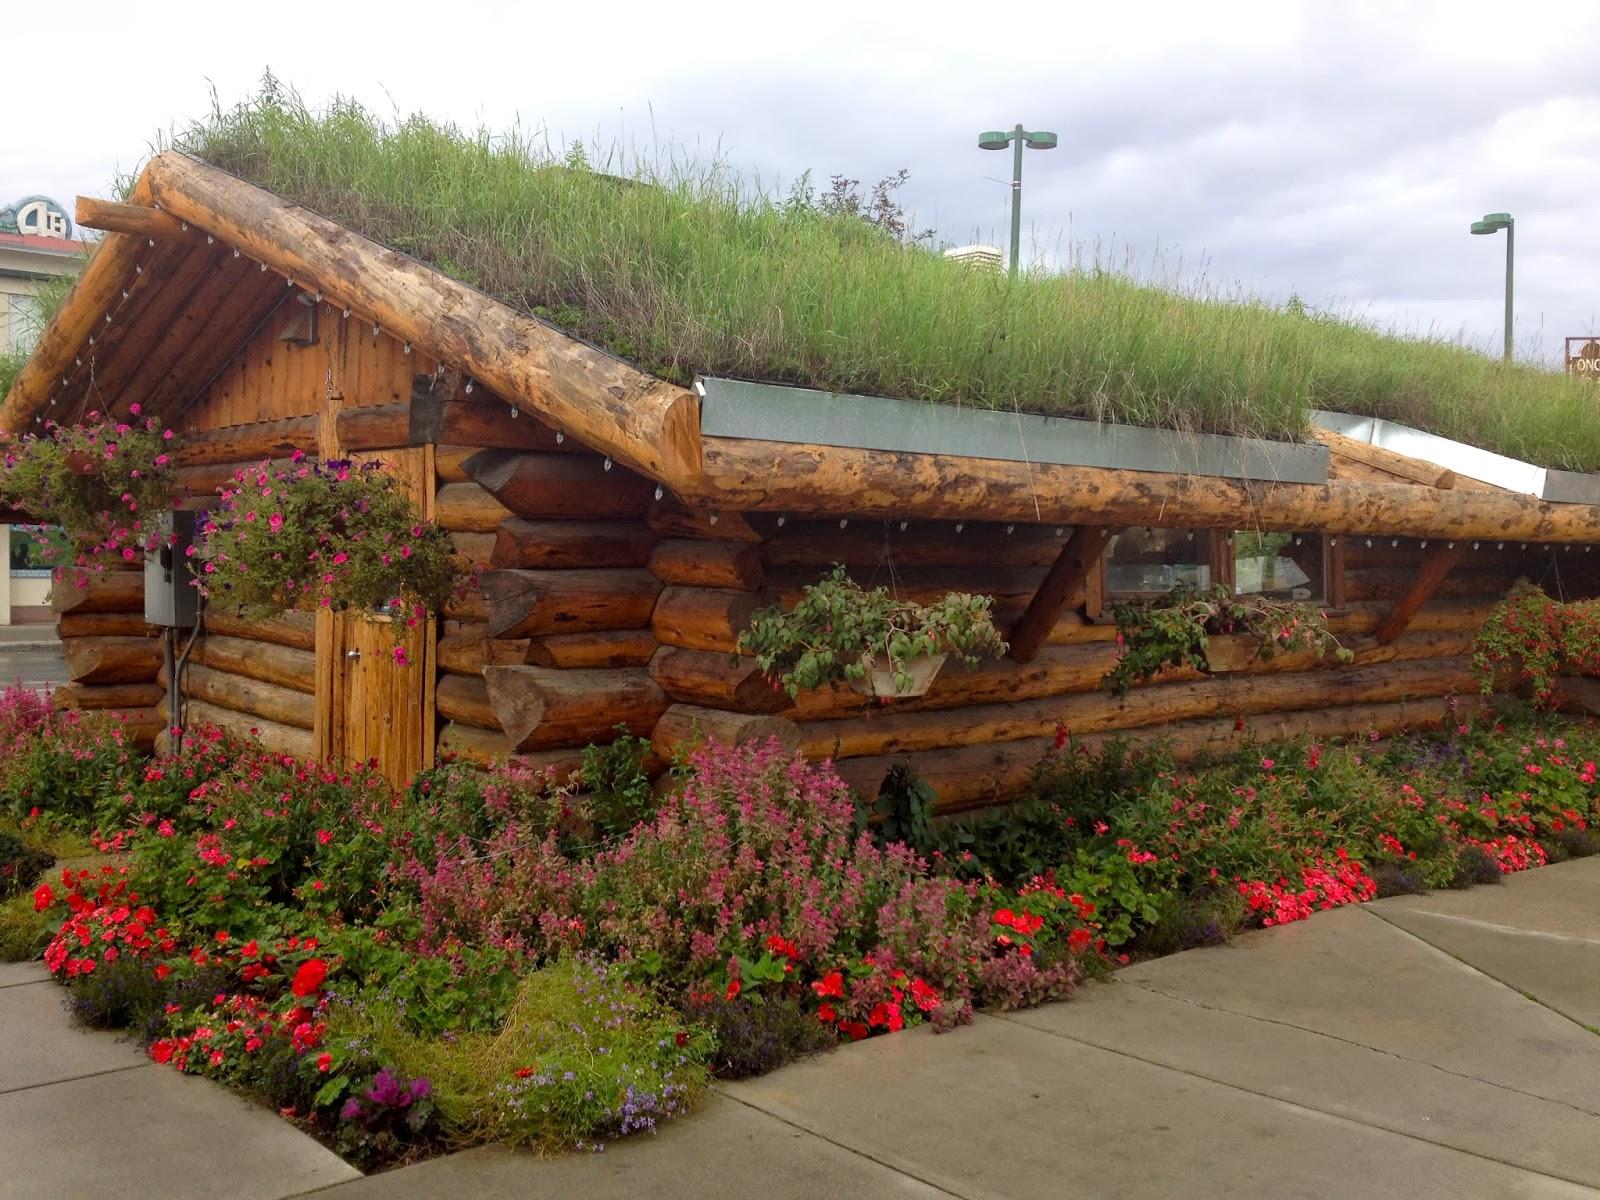 The Alaskan Honeymoon: Part One (Anchorage, AK) – Amateur Bot-ann-ist